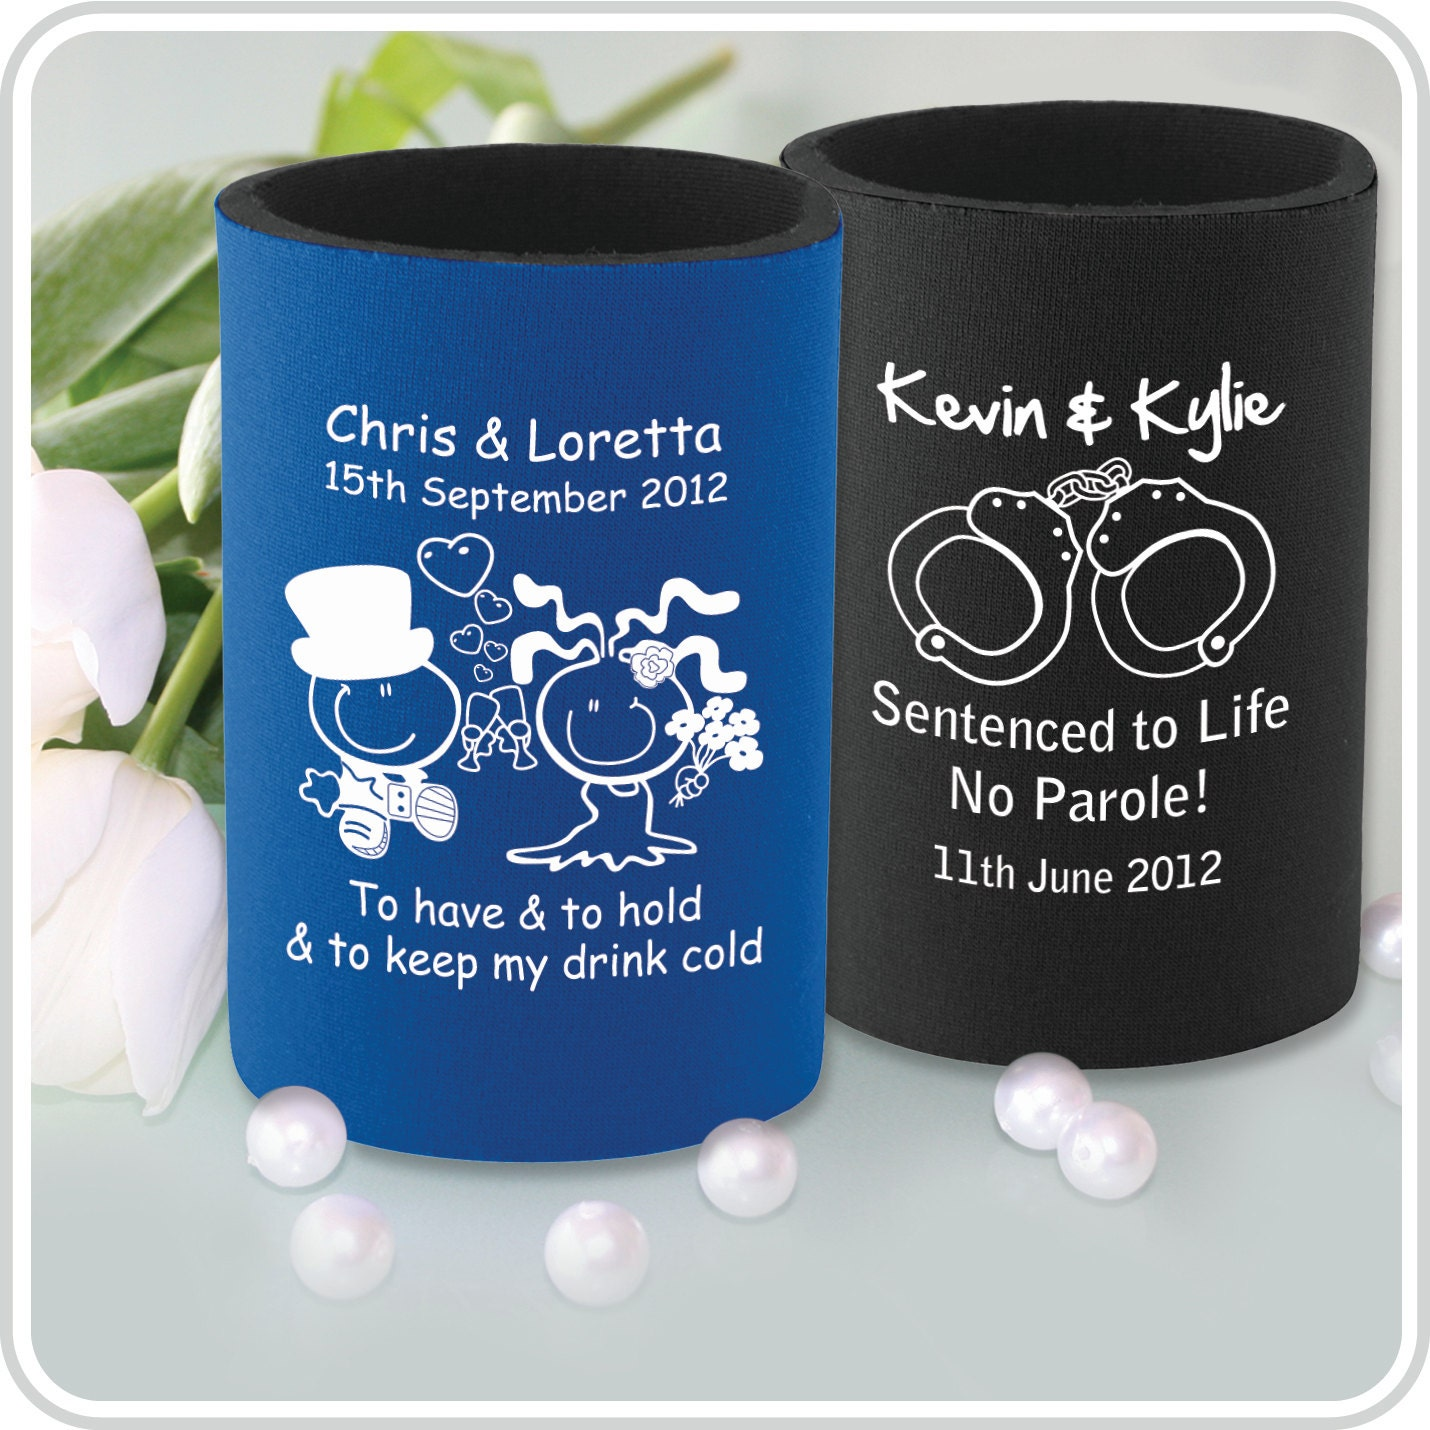 Wedding Gift Stubby Holders : 60 Printed Stubby Holders Coolers Wedding by PersonalisedFavours